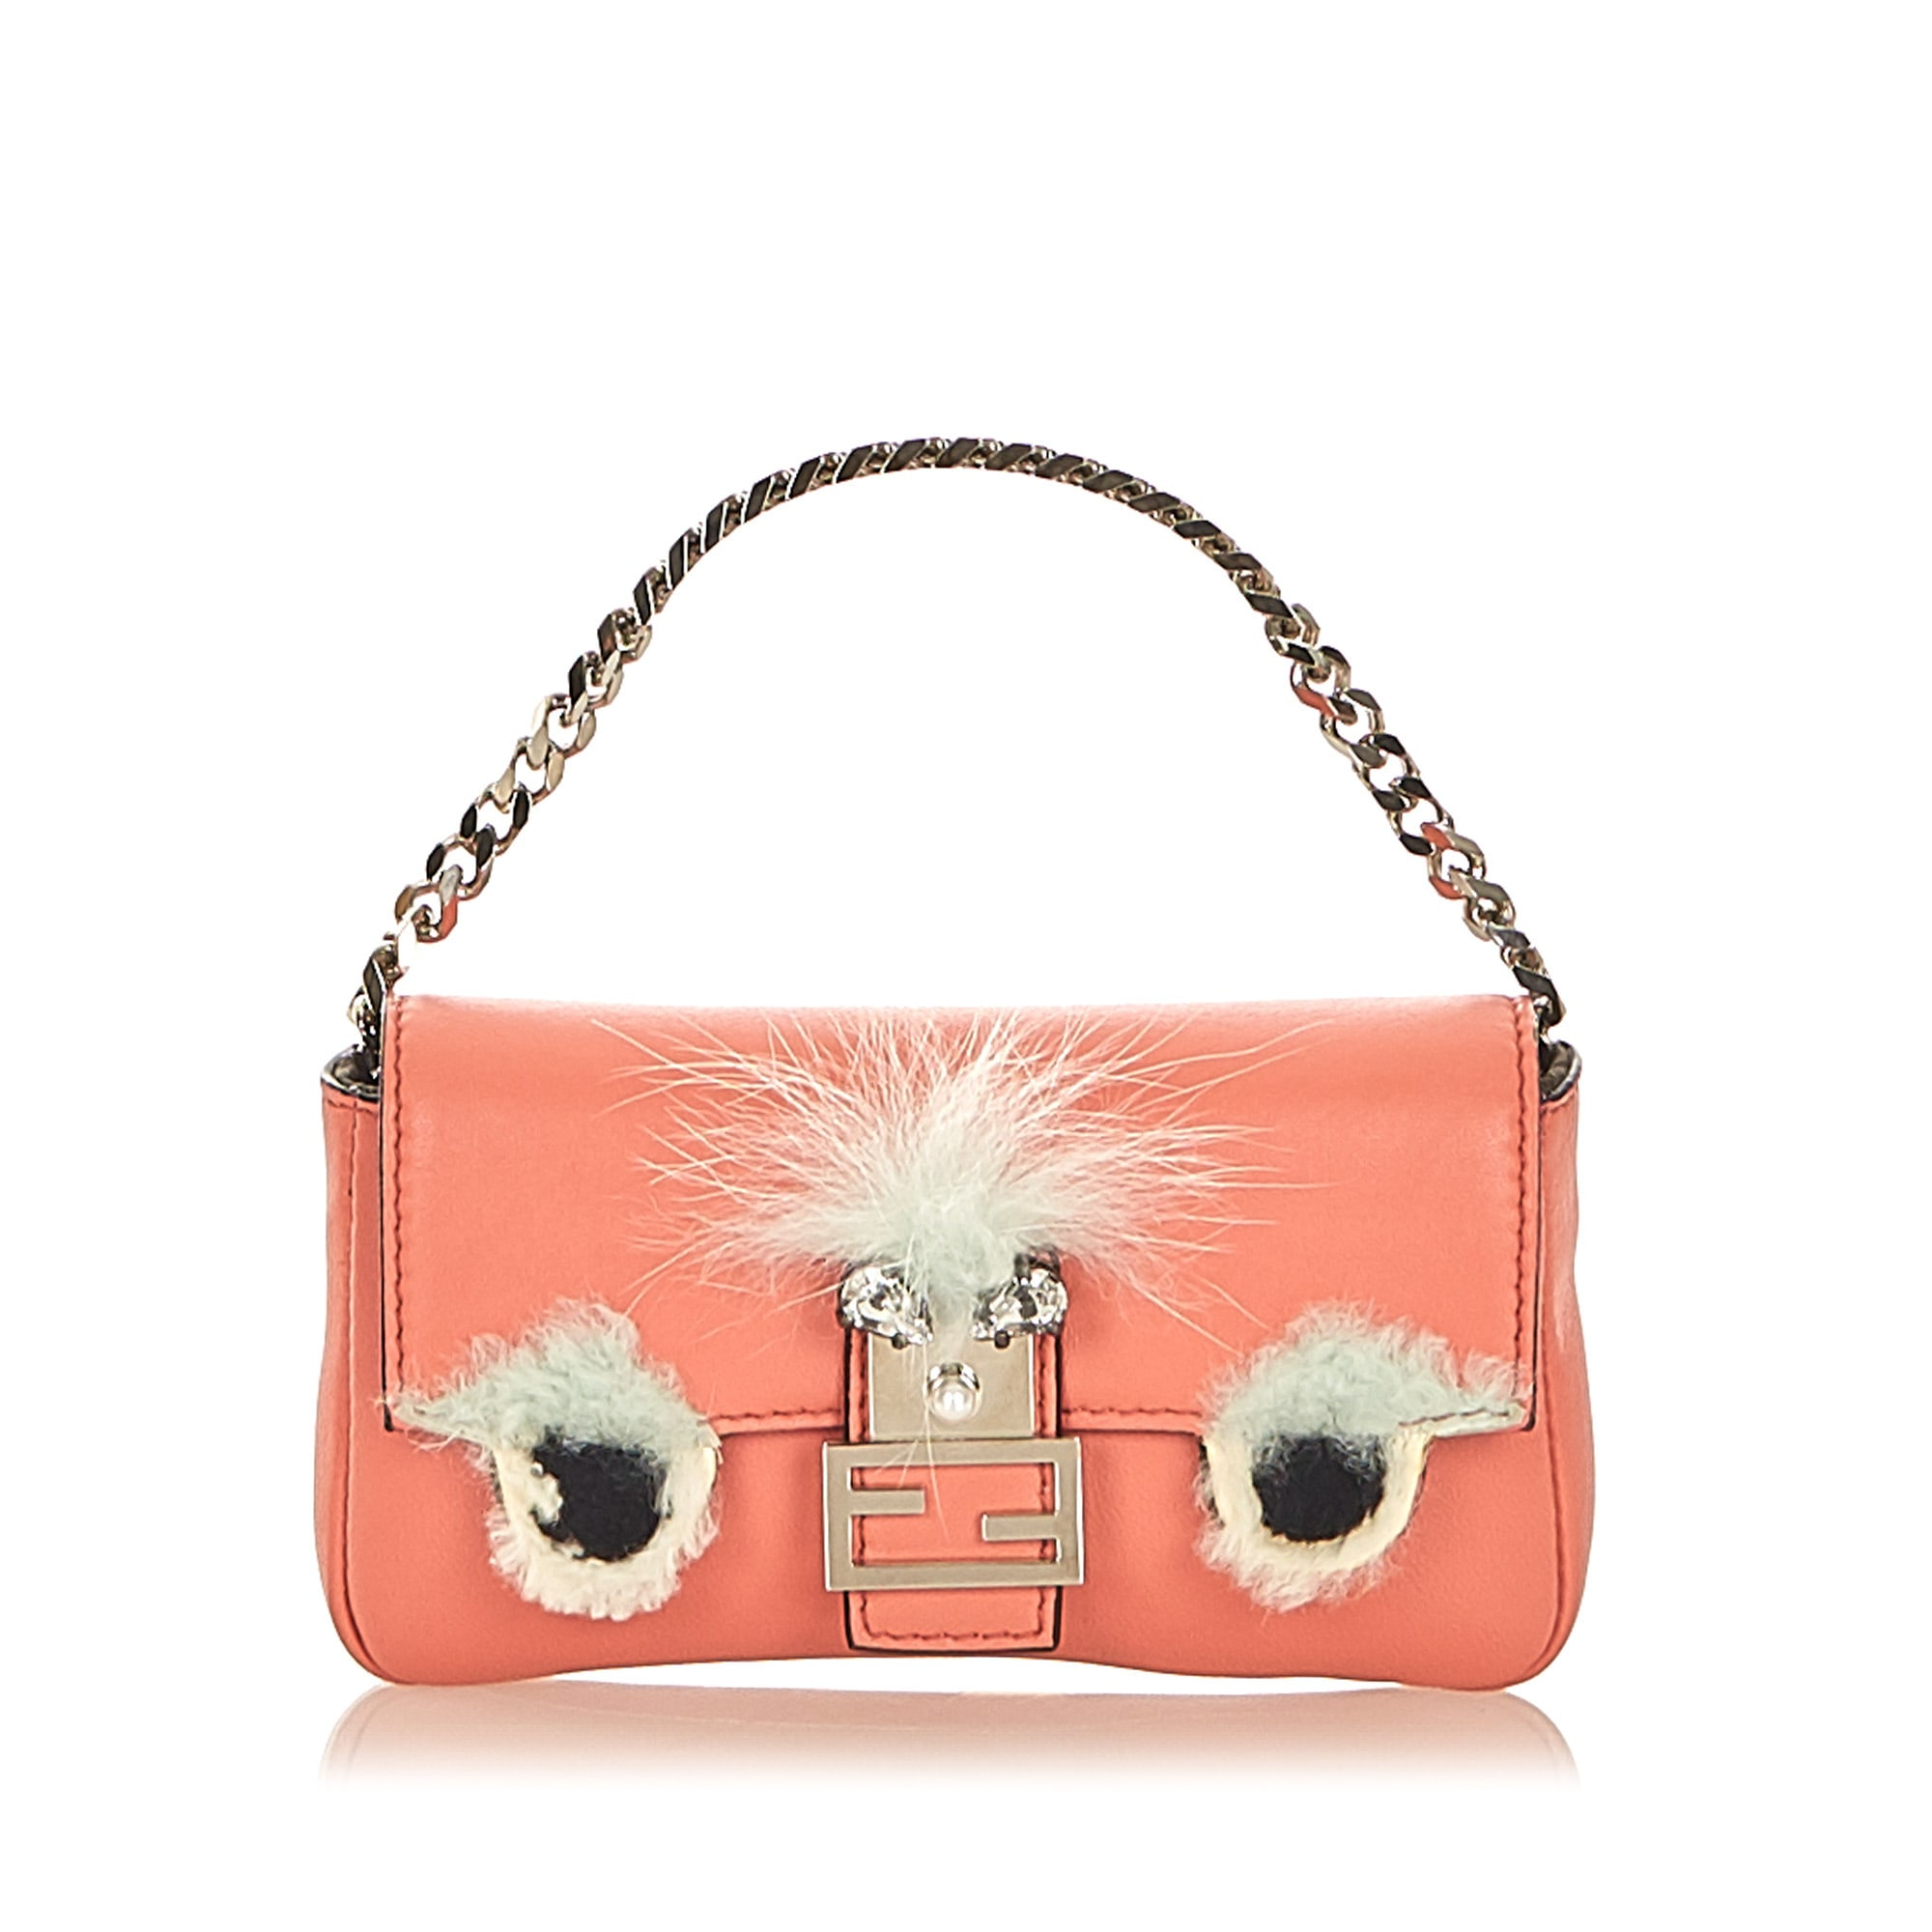 Lederhandtasche FENDI Pink